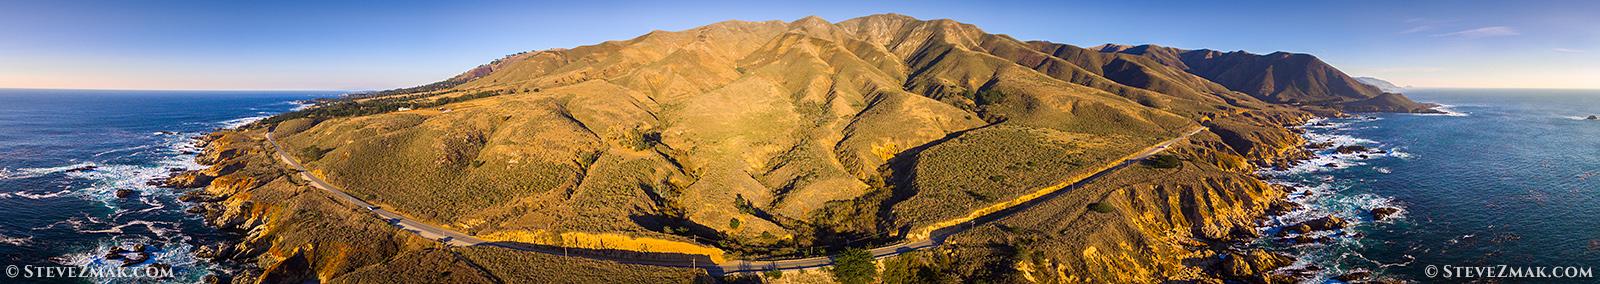 Highway 1 & Garrapata State Park, California